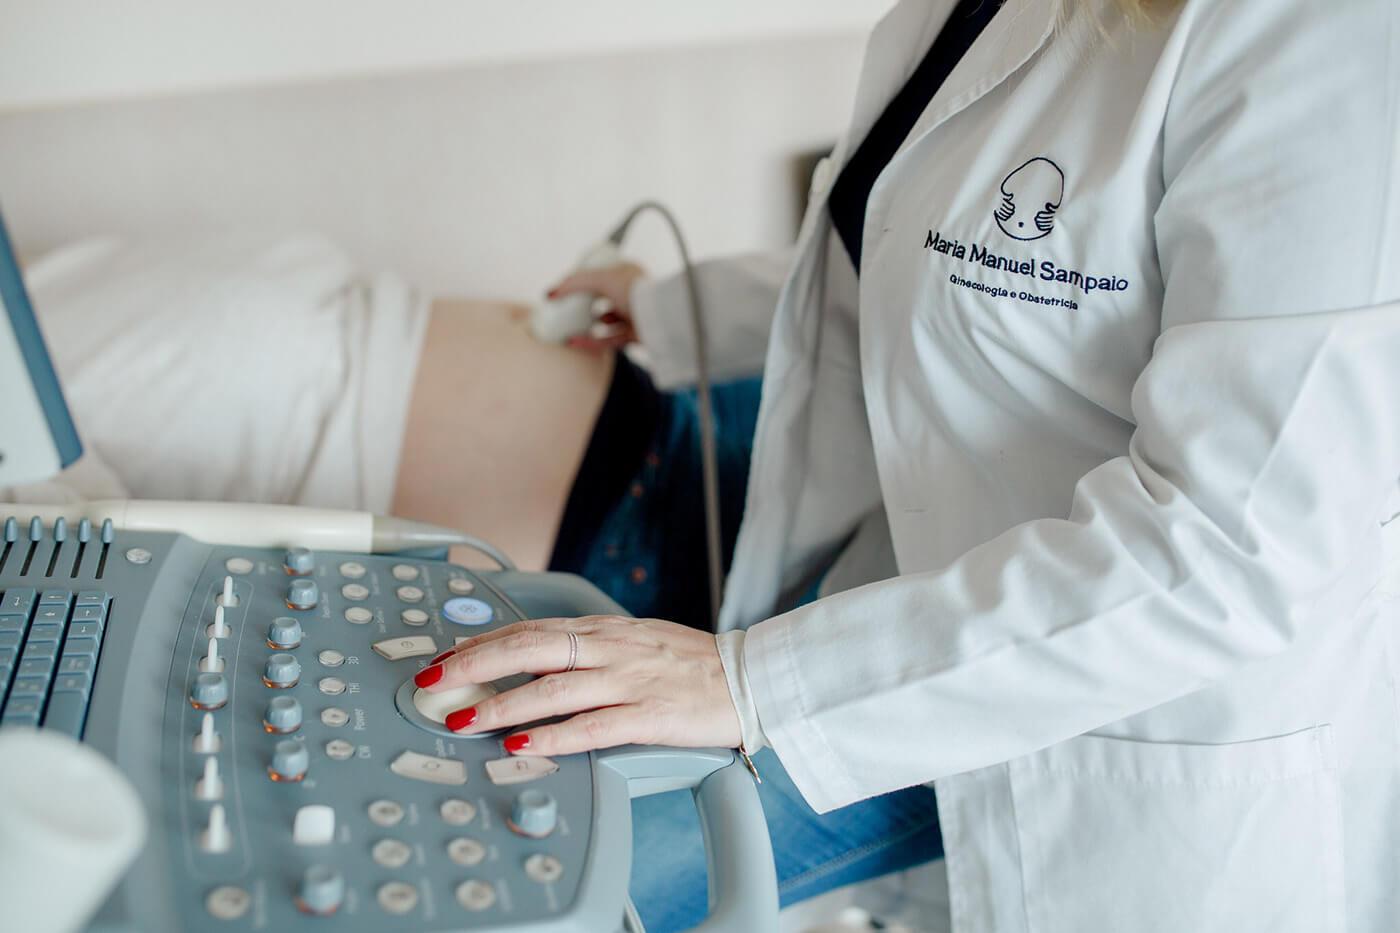 Maria Manuel Sampaio, personal branding, maternity, gynecology, pregnancy, logo, website